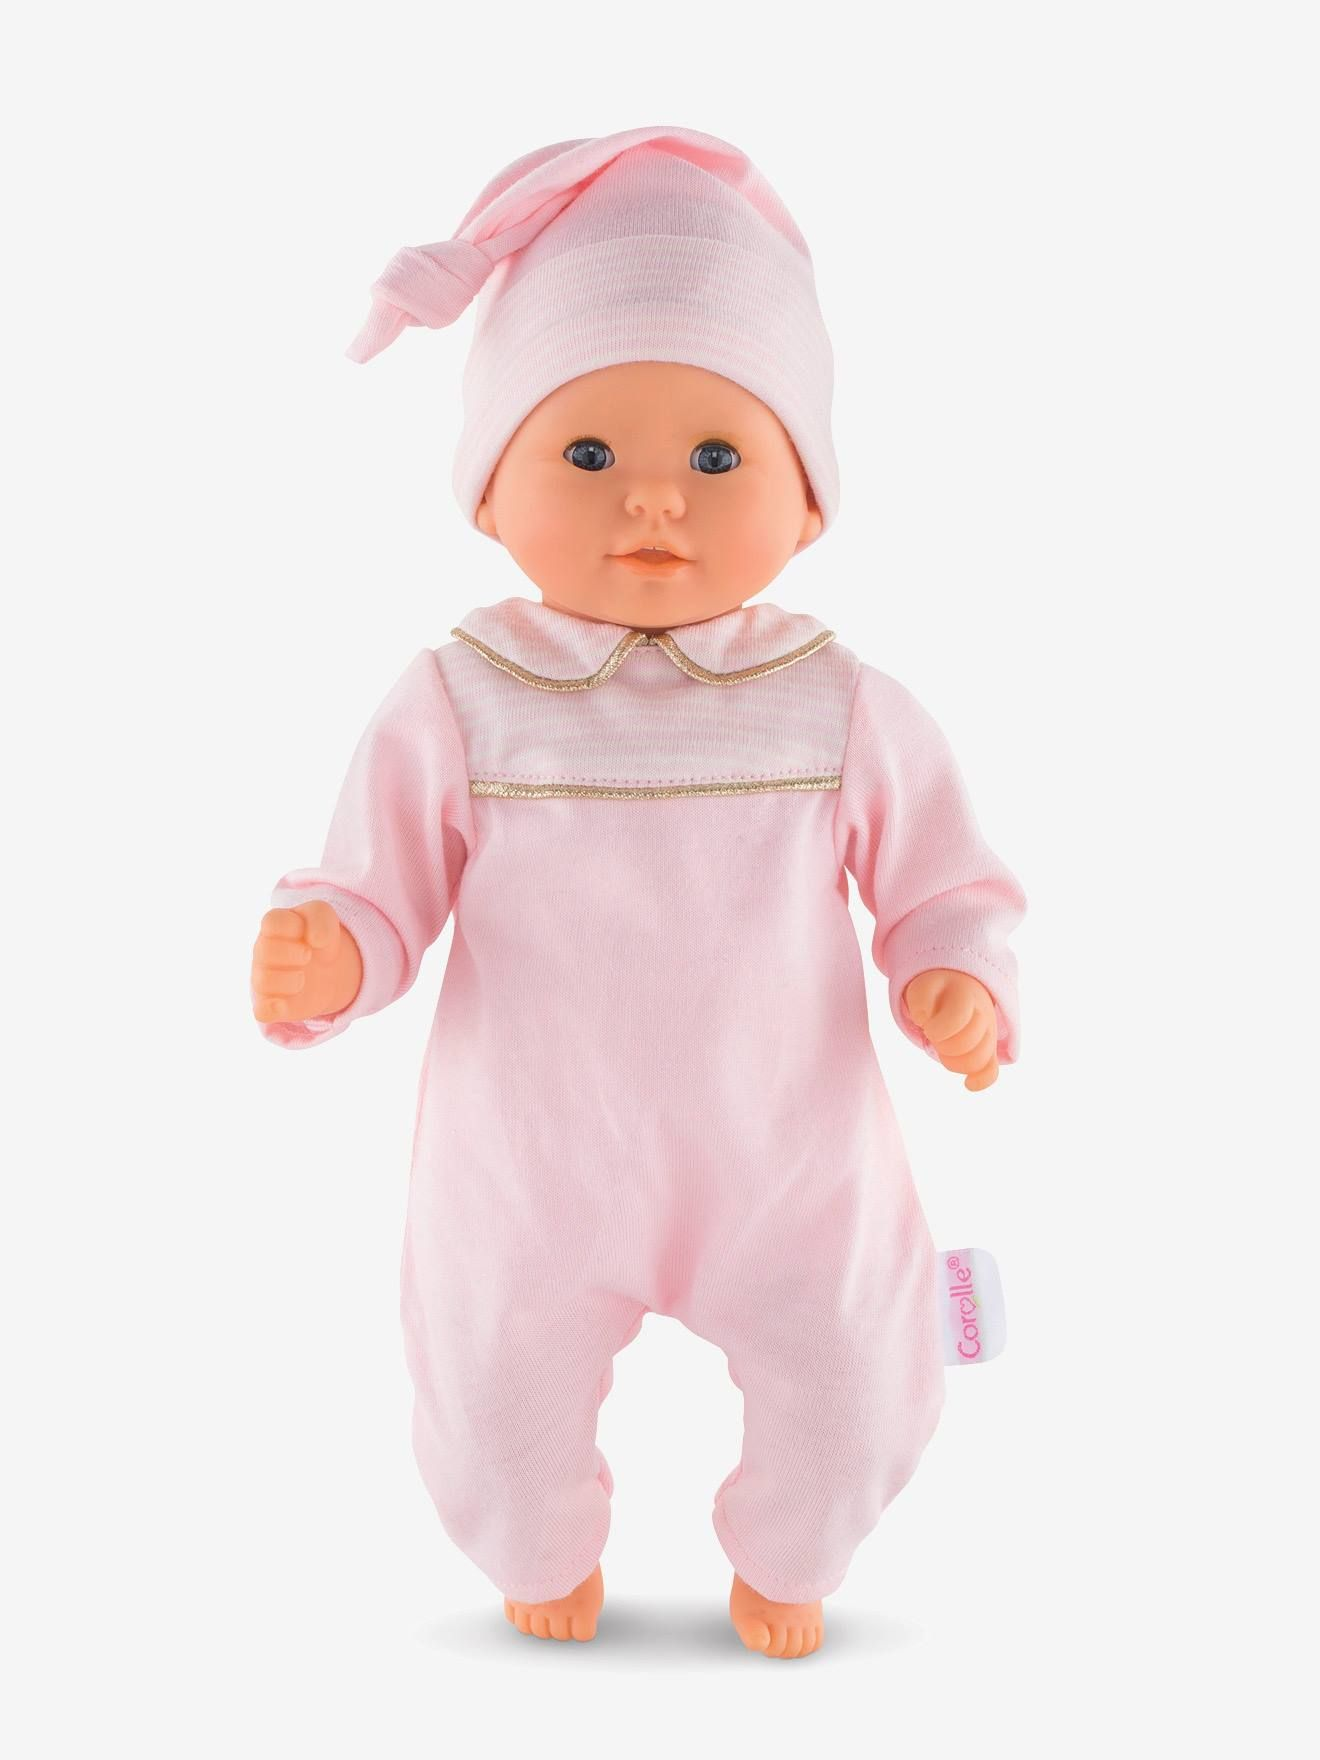 Margot Enchanted Winter Corolle Mon Premier Poupon Bebe Calin 12 Baby Doll